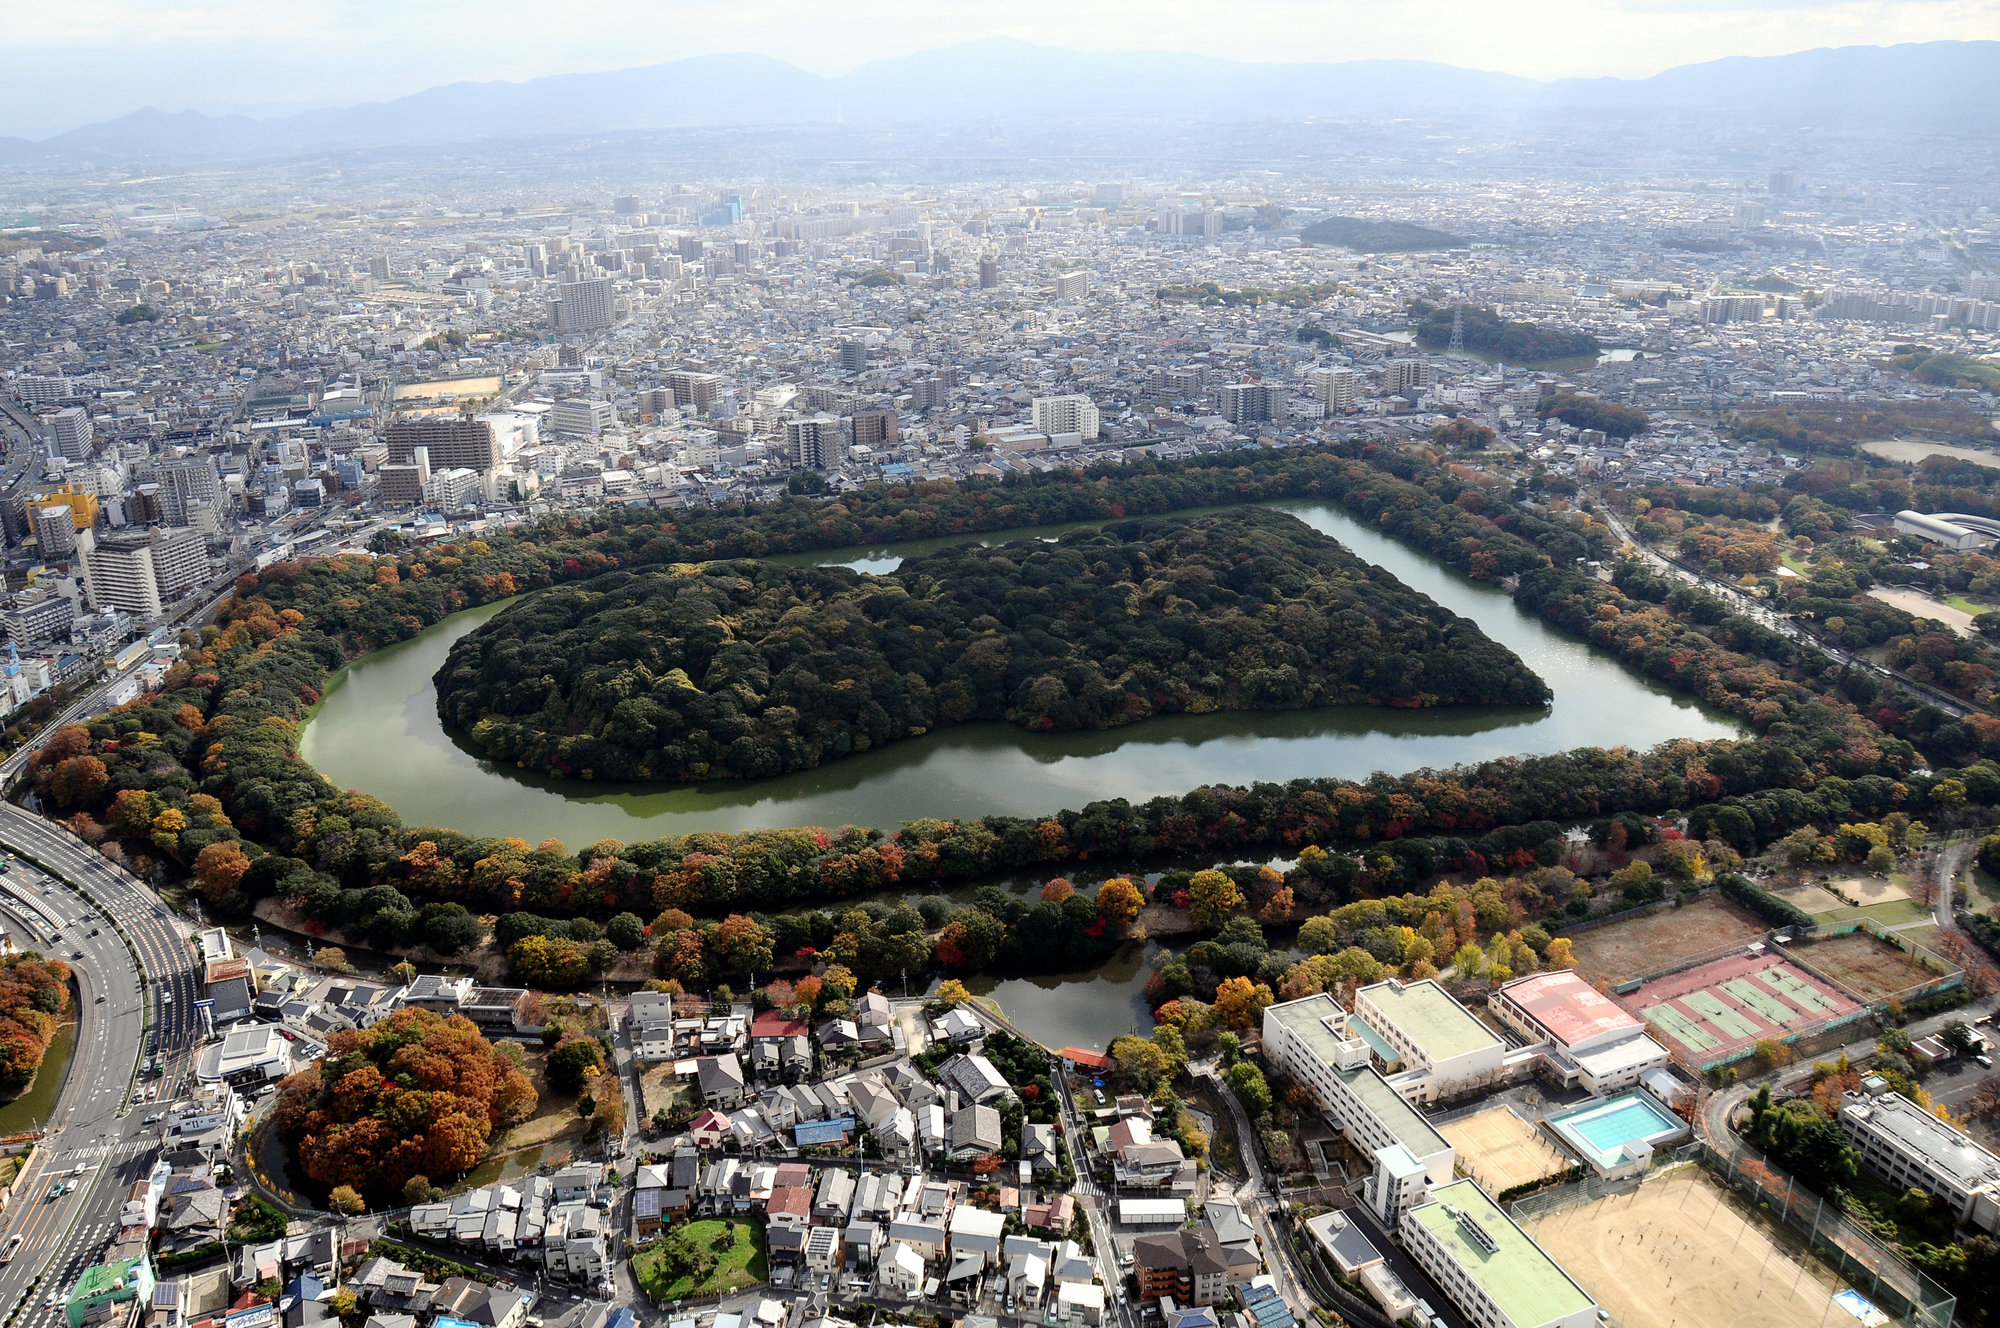 Sakai City, Osaka Prefecture:Daisen Mounded Tomb supposed to be the Mausoleum of Emperor Nintoku